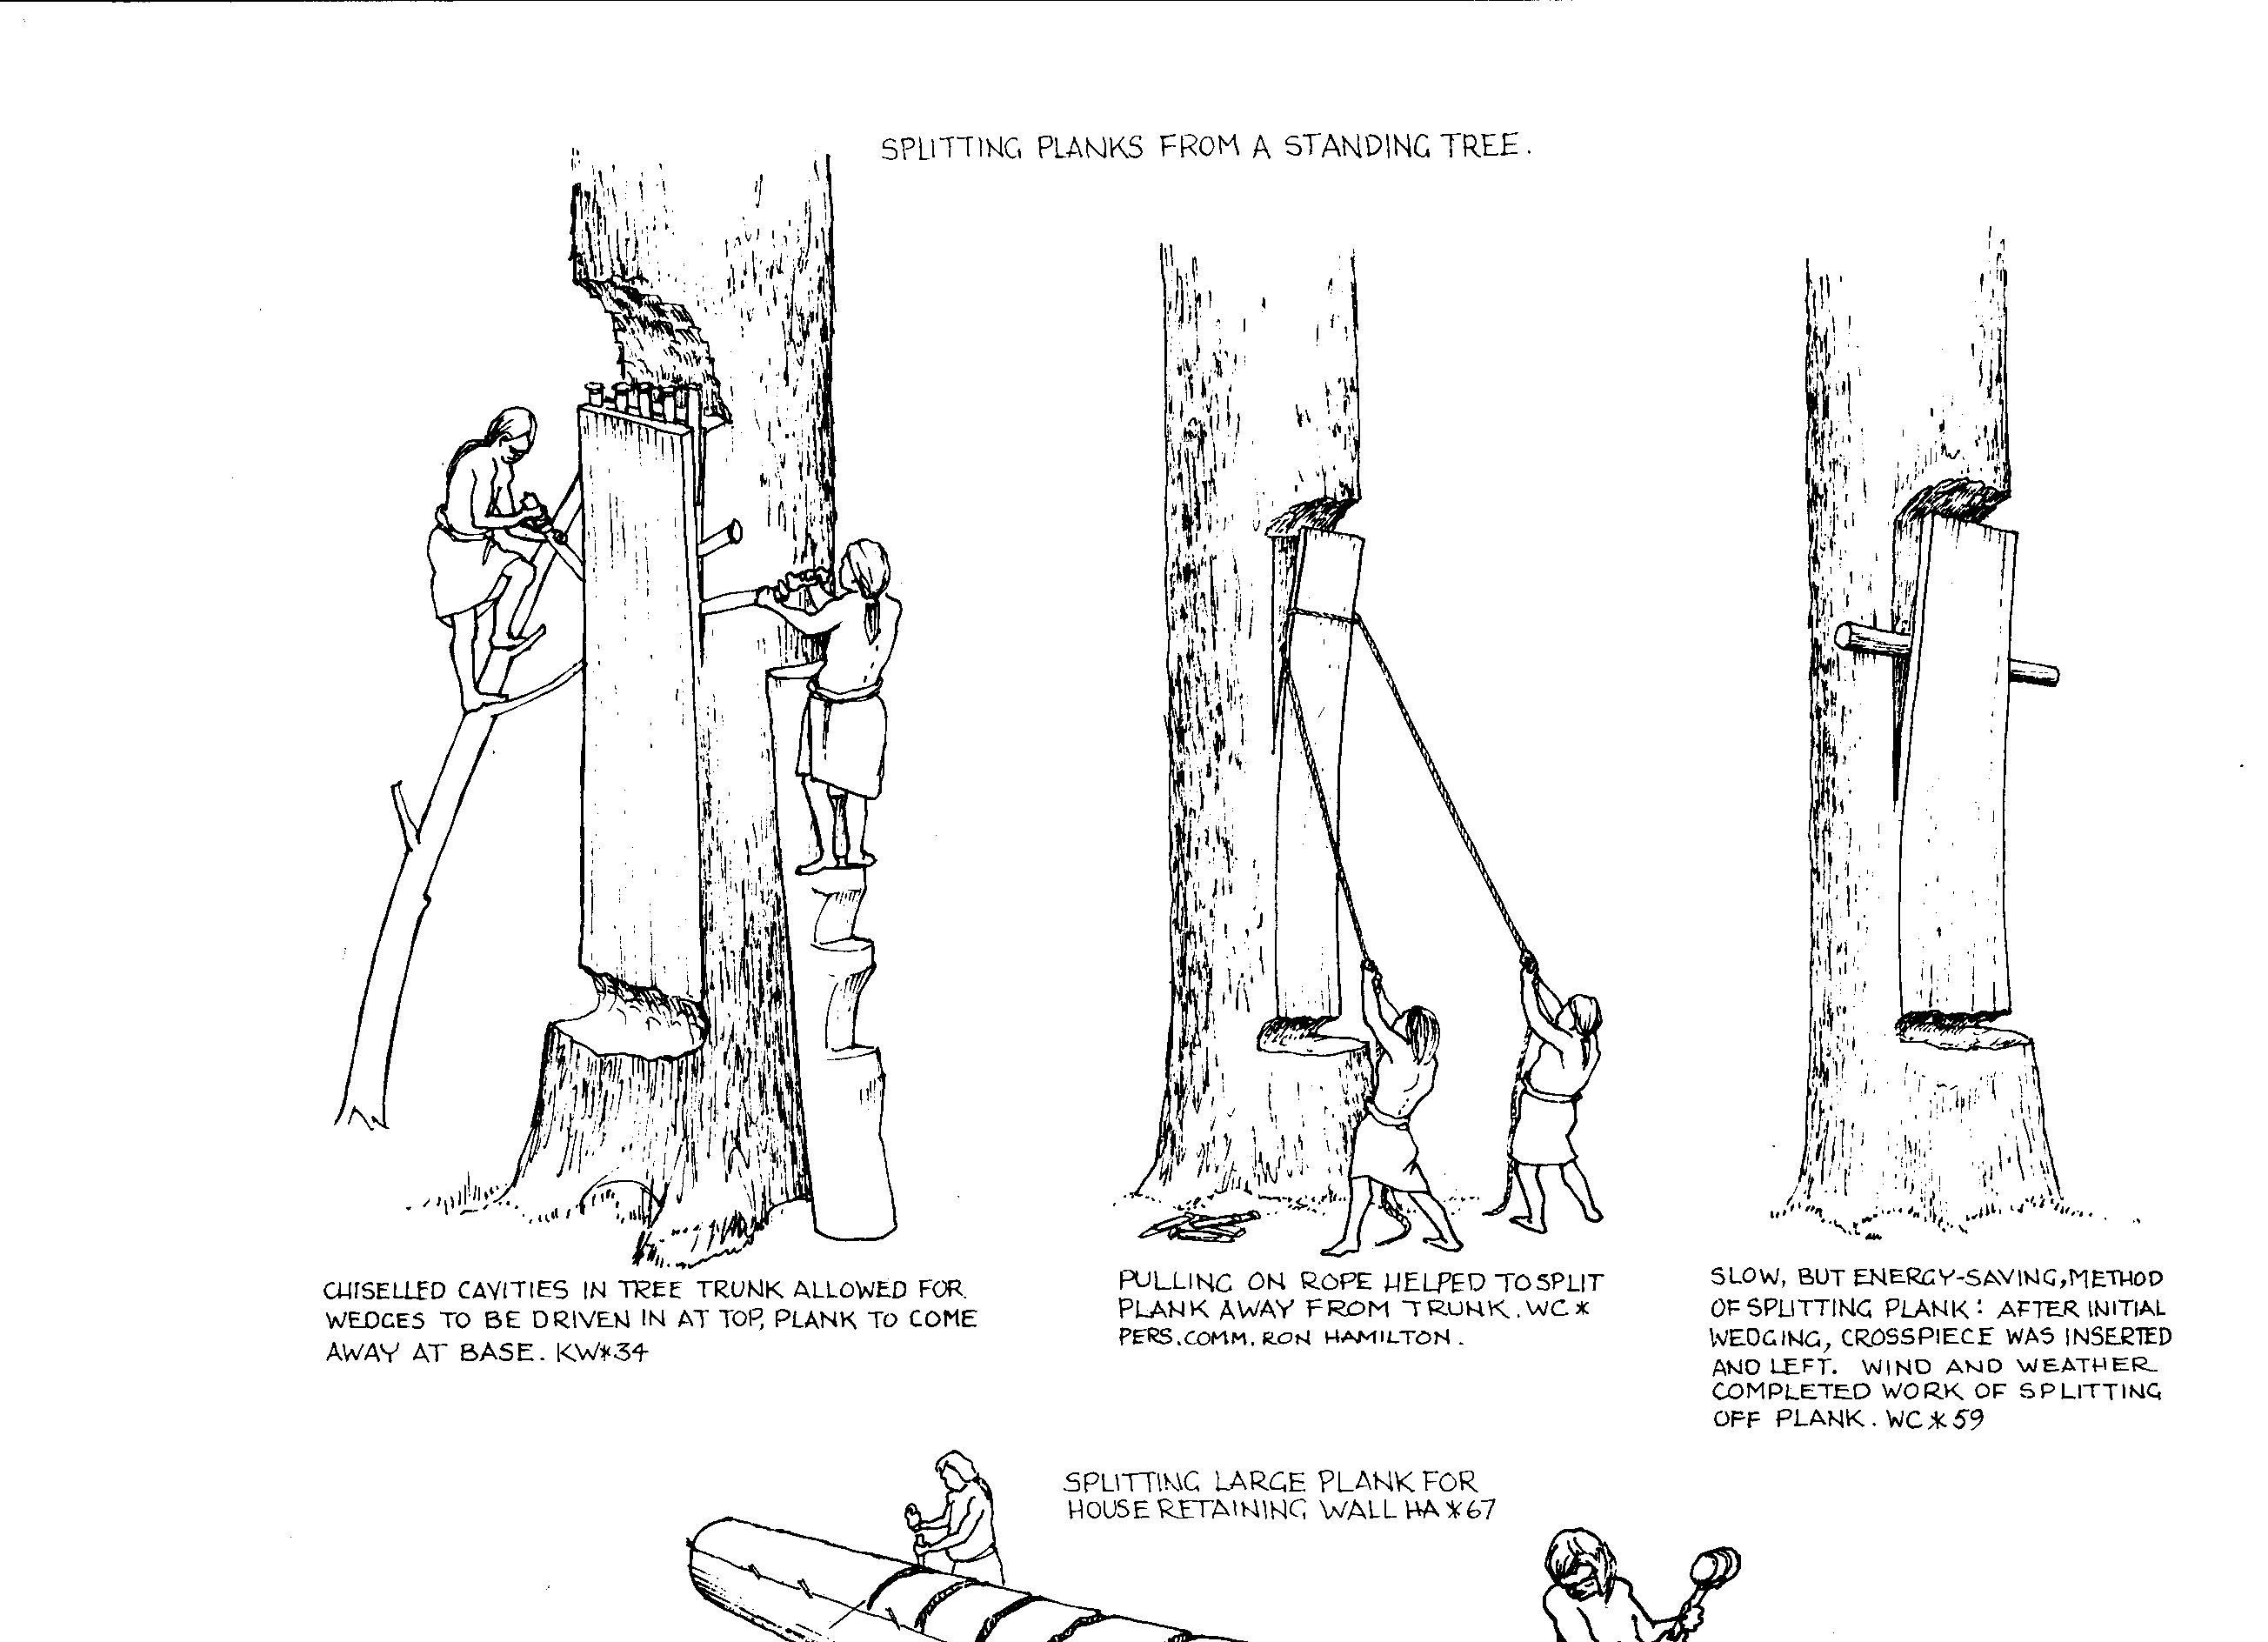 Drawn planks school Hilllary Services Tree cedar jpg